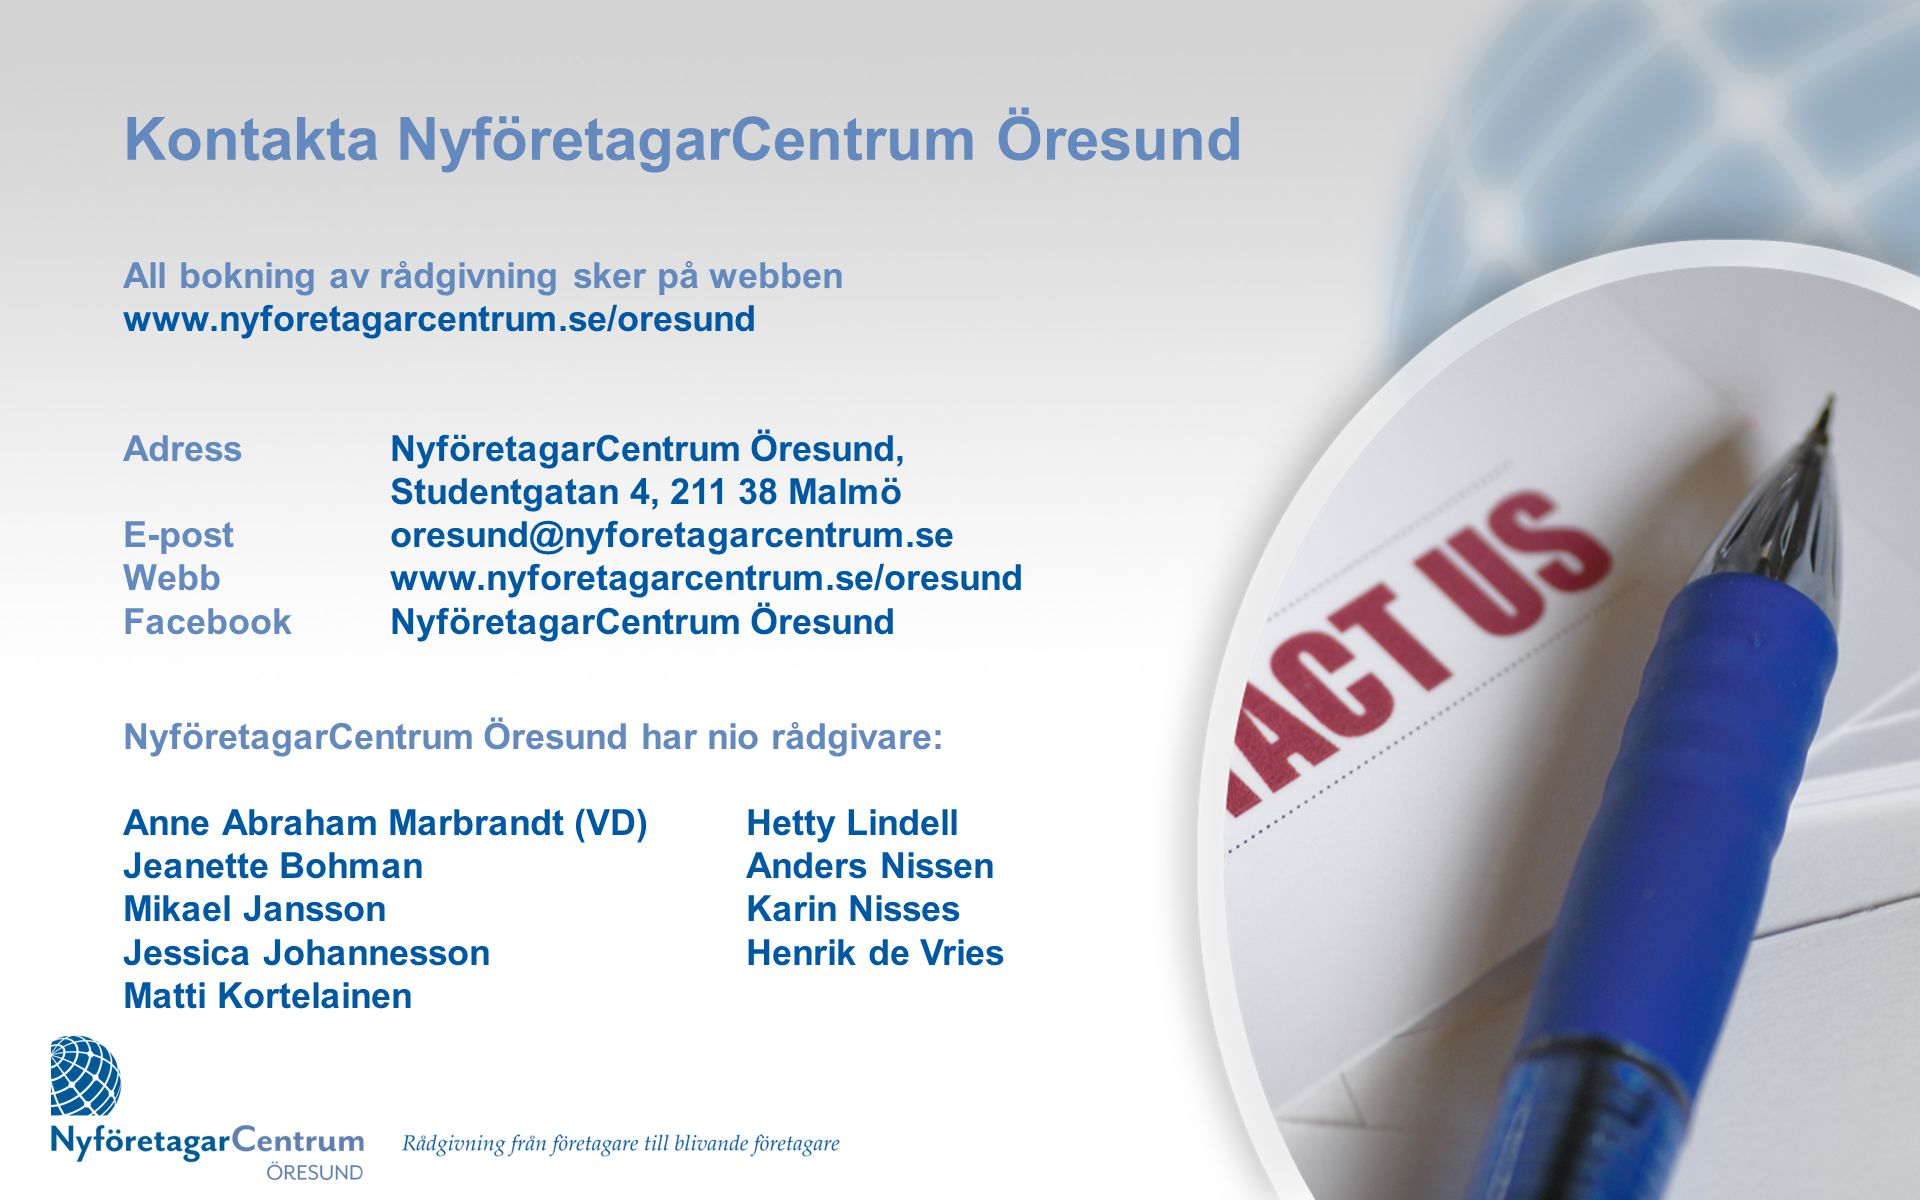 Kontakta NyföretagarCentrum Öresund